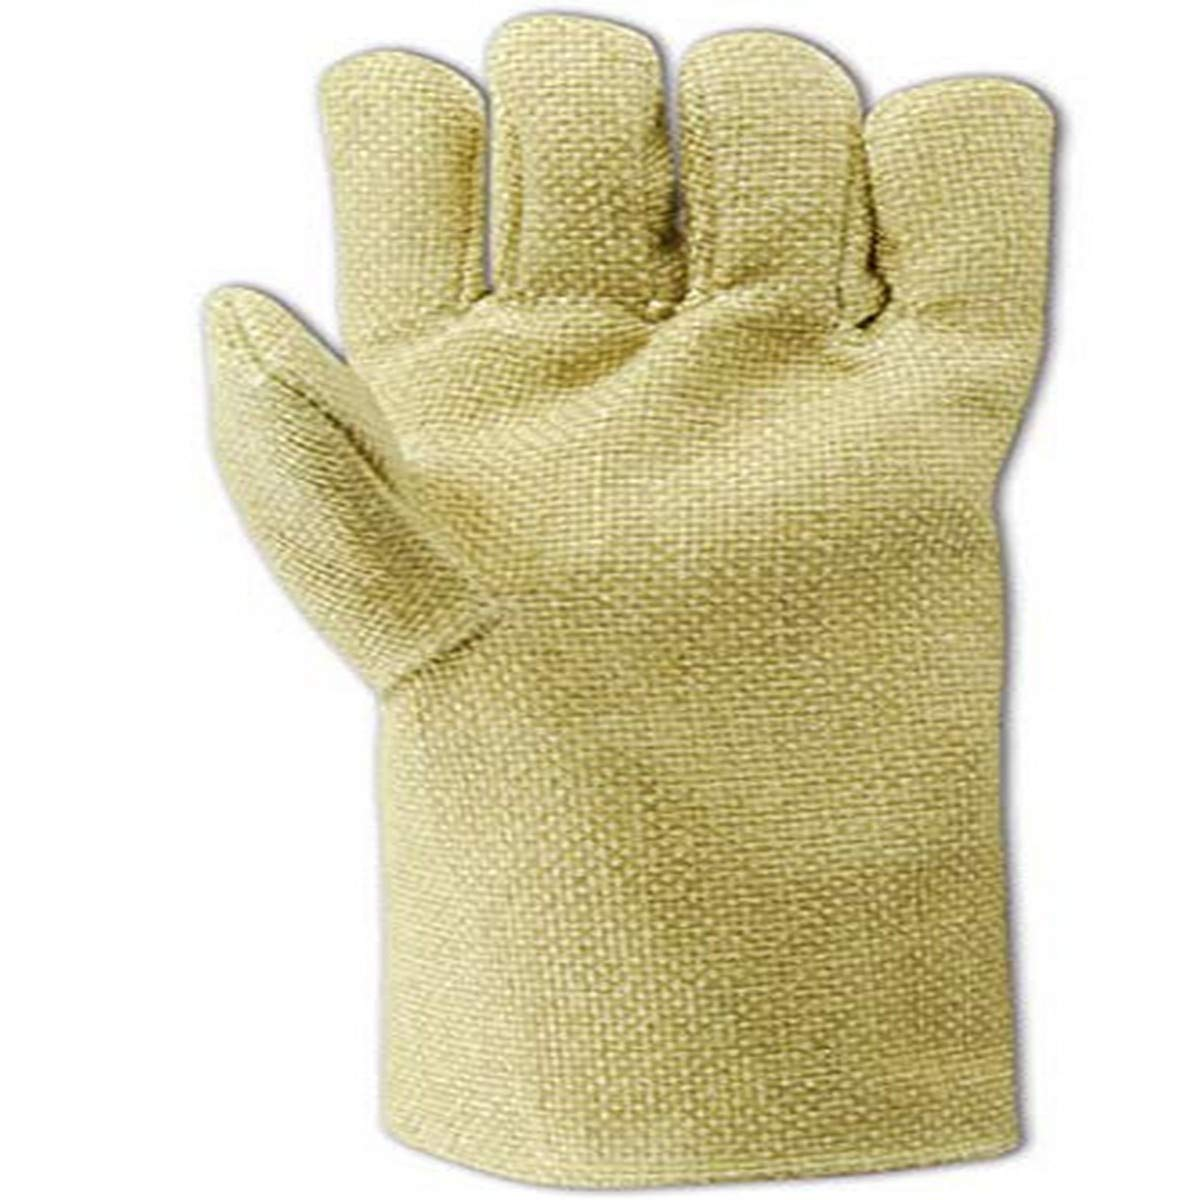 Magid Glove & Safety PZ1314WL High-Heat Glove, X-Large, Tan